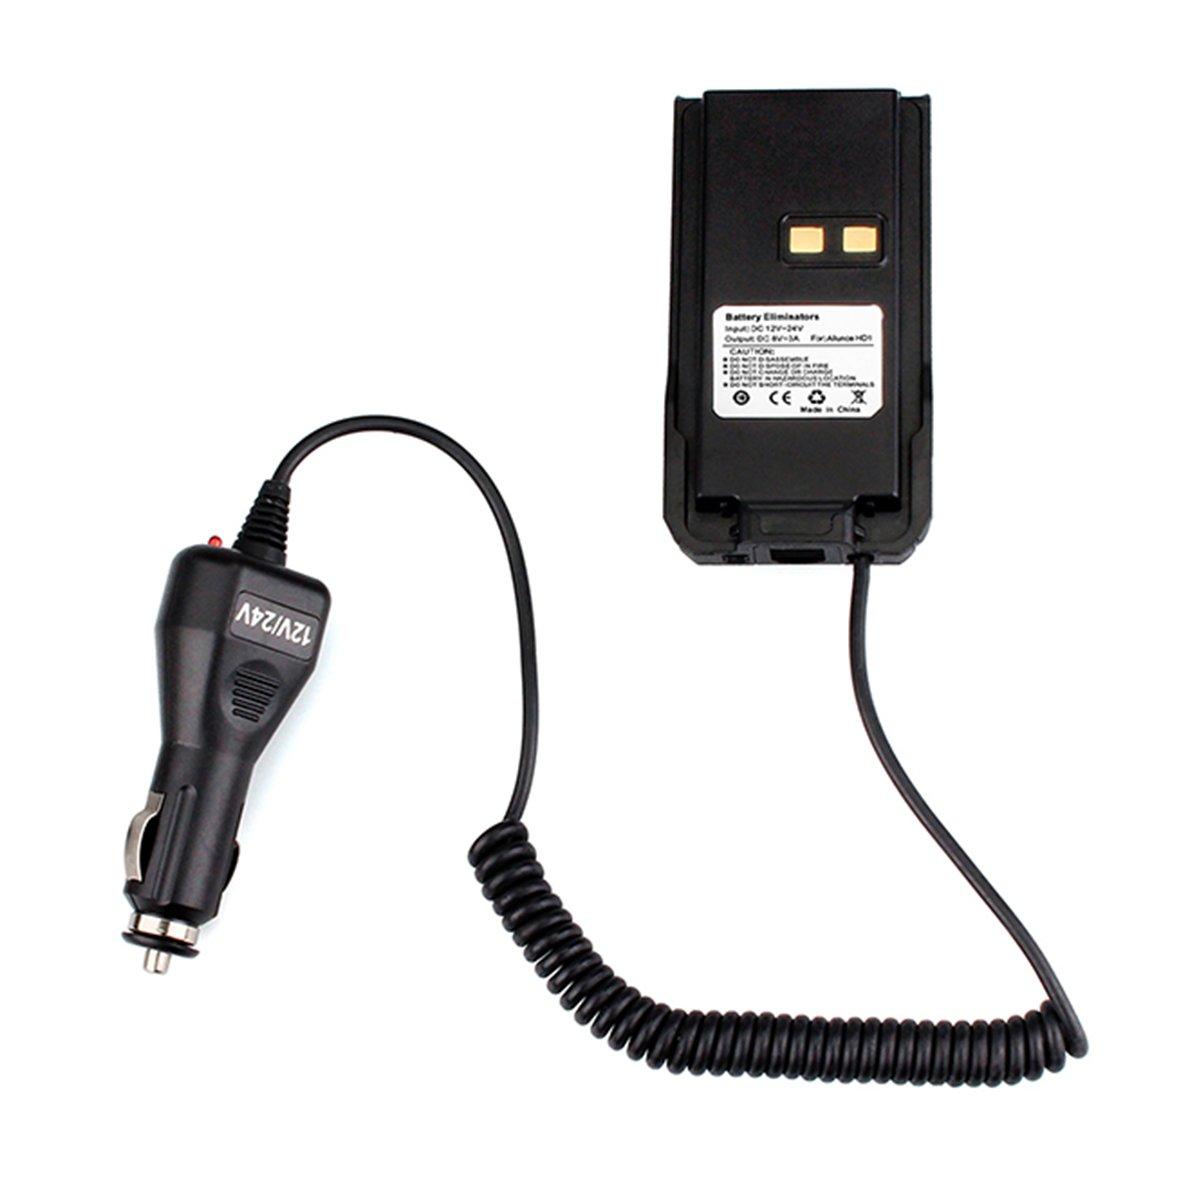 Ailunce Car Charger Battery Eliminator 12V-24V for Ailunce HD1 DMR Radio